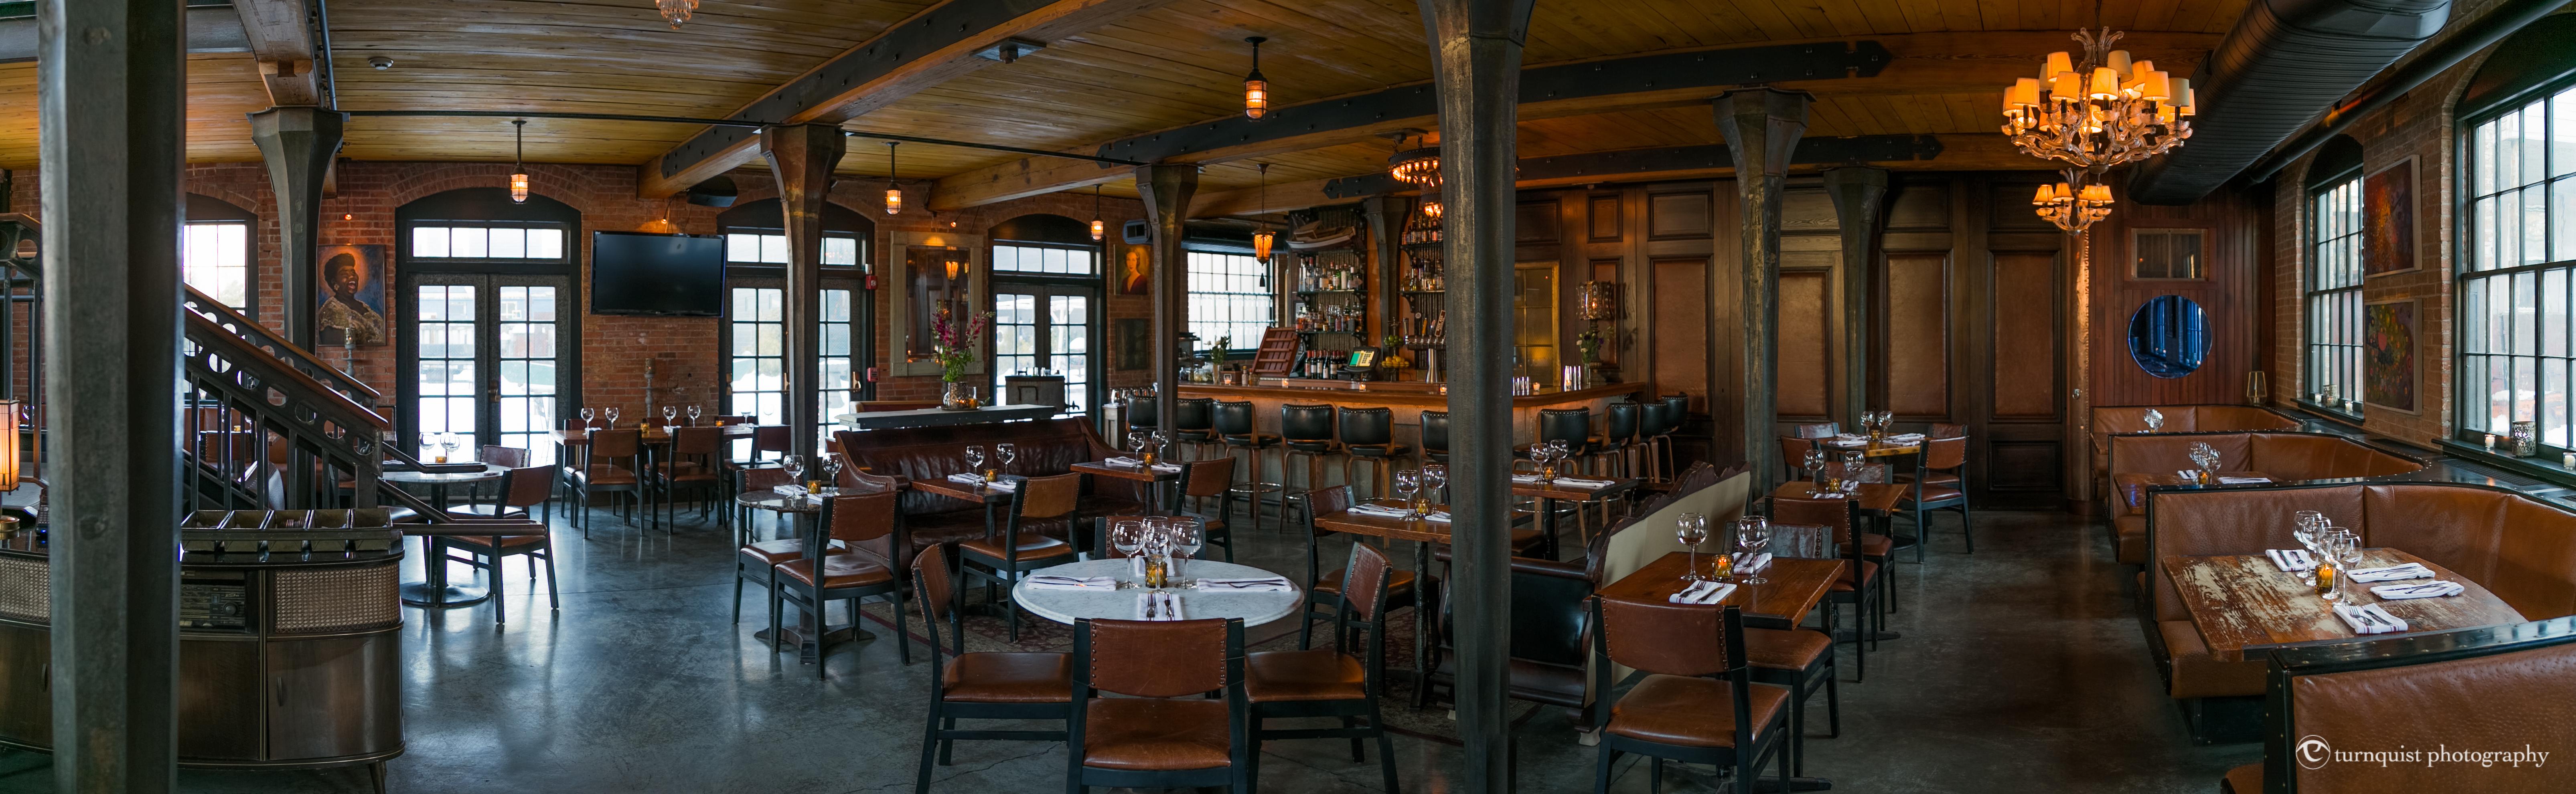 Hudson New York The Restaurant Columbia Country Helsinki 518 828 4800 405 Street 12534